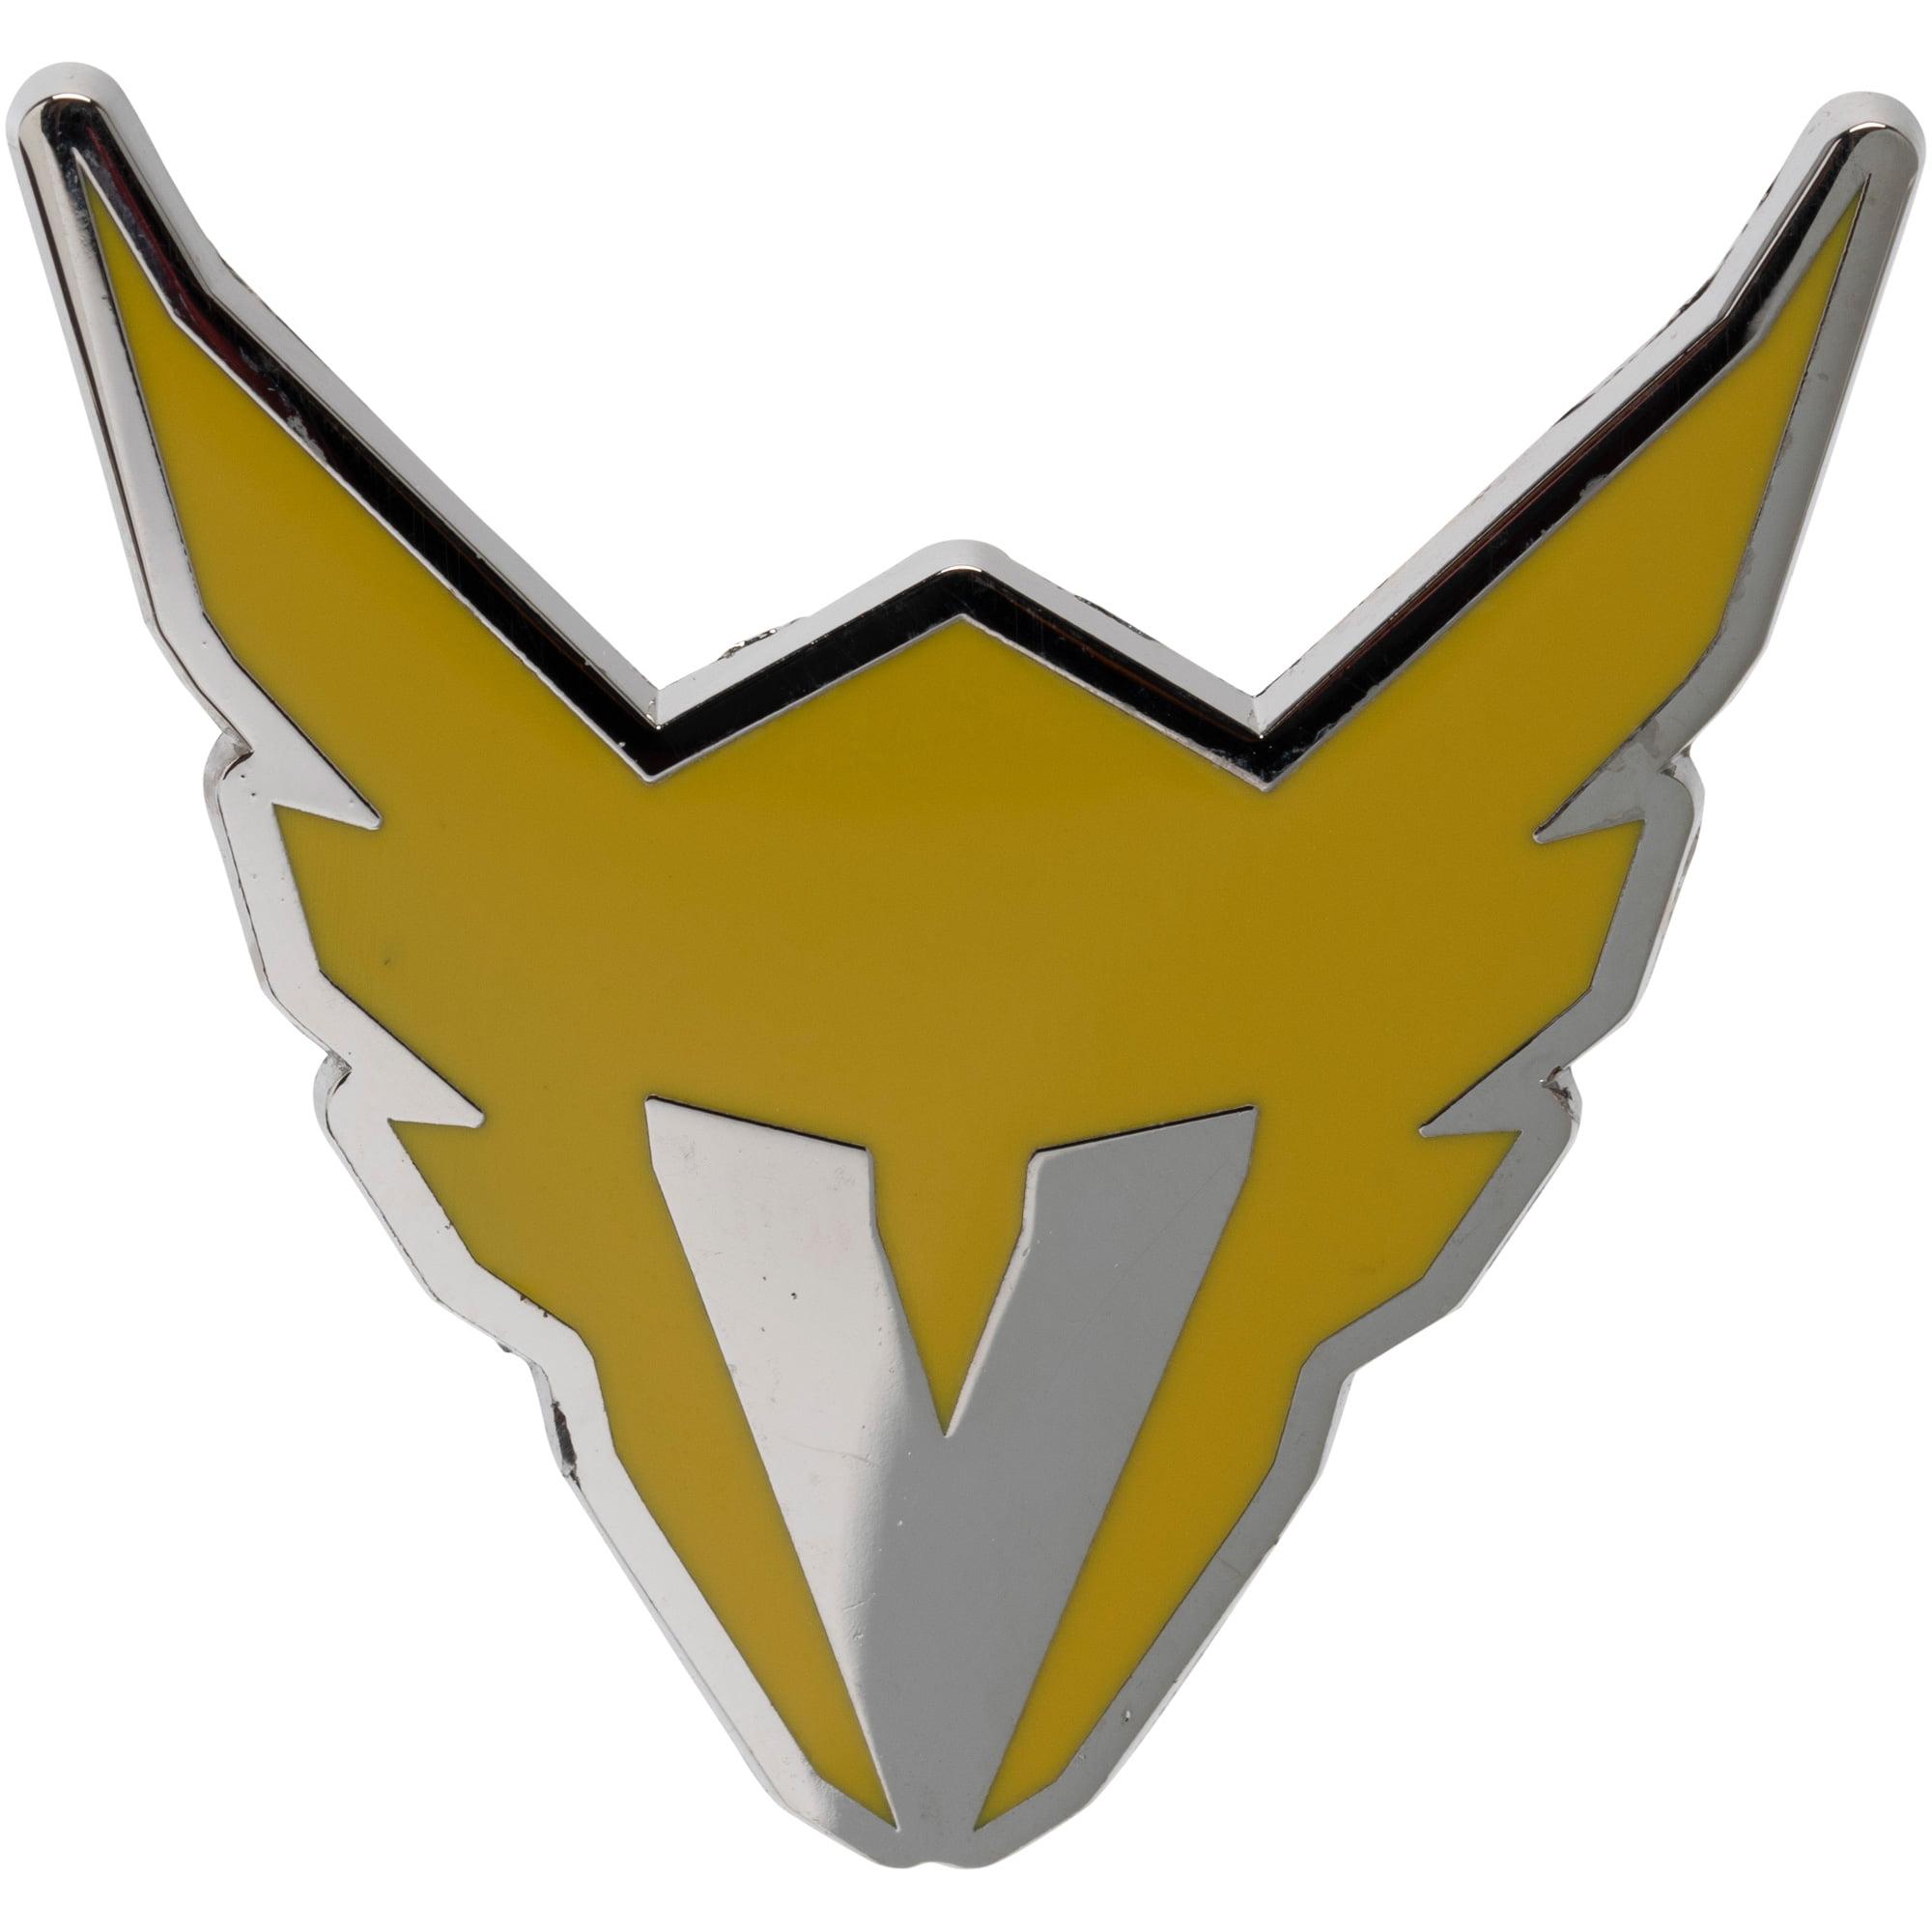 Los Angeles Valiant Overwatch League Team Logo Pin - No Size